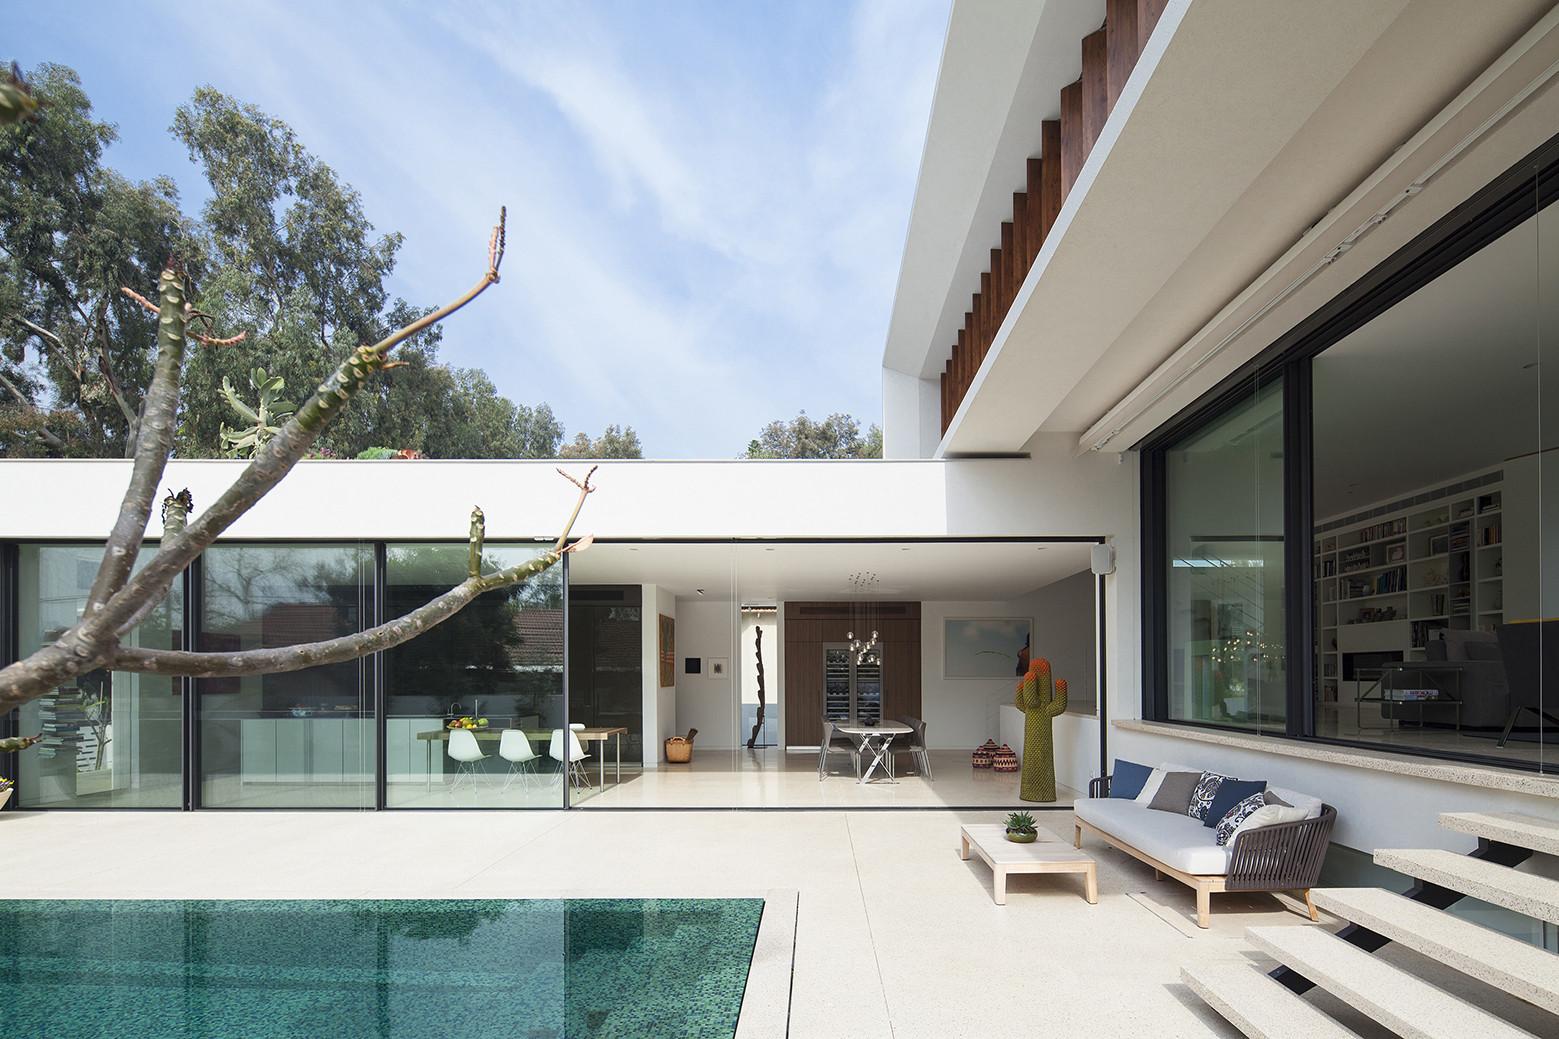 Gallery of mediterranean villa paz gersh architects 9 for Minimalist house uk